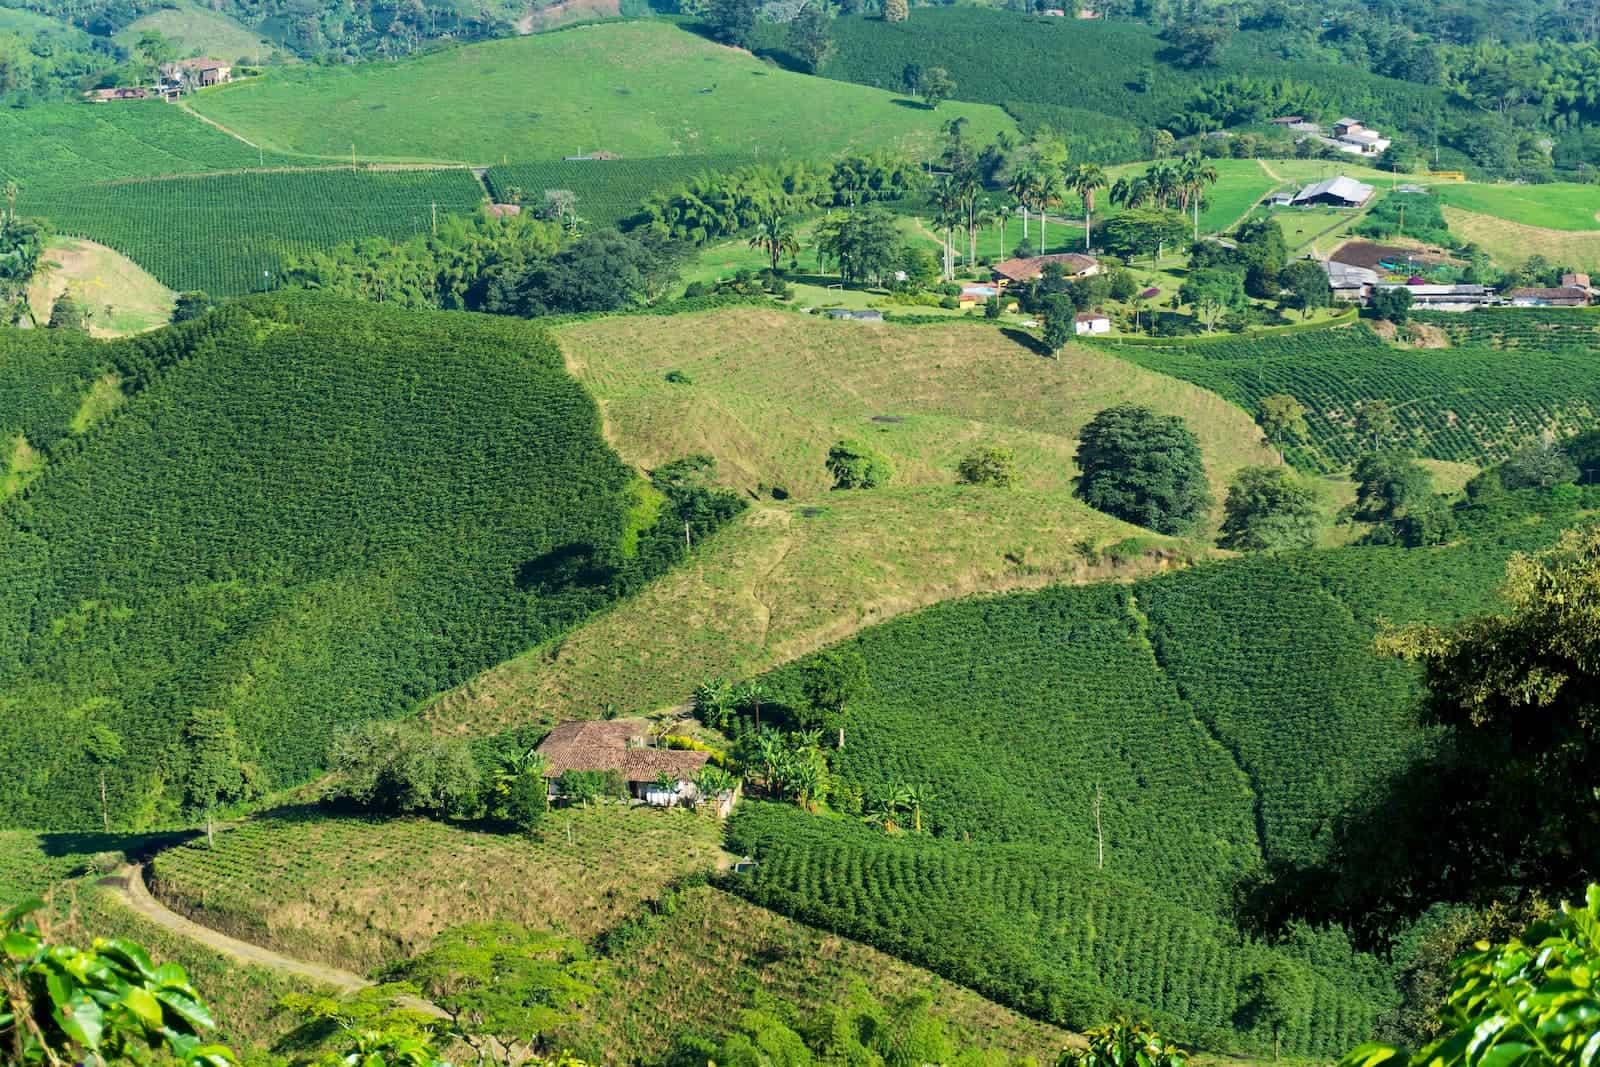 fazendas cafeeiras de café na colômbia